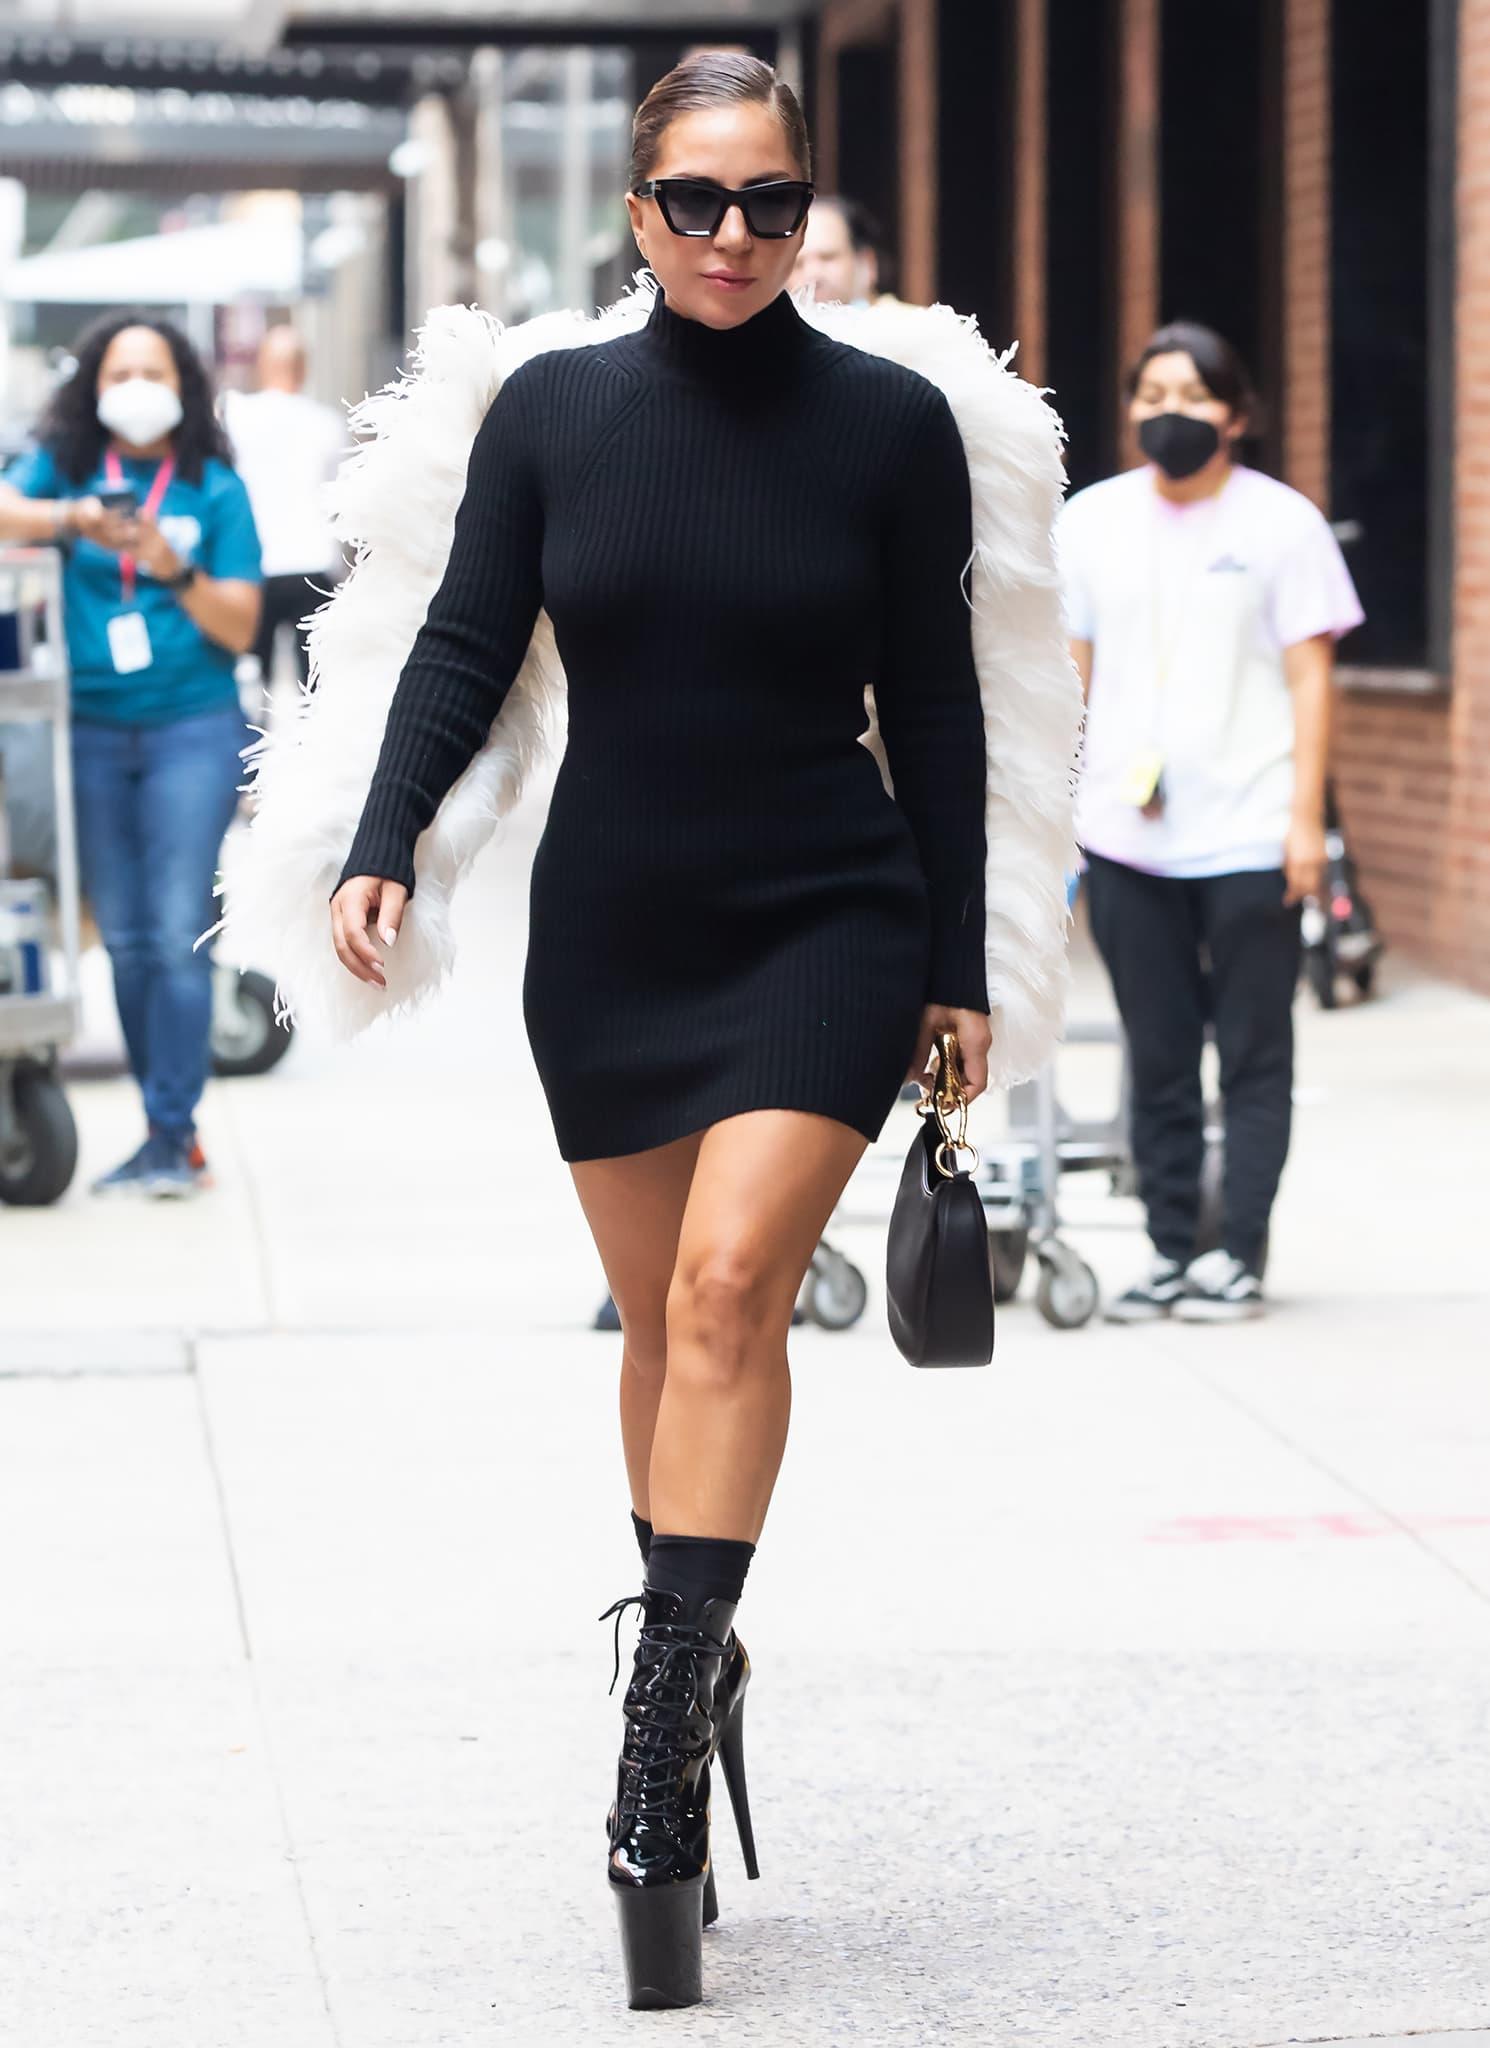 Lady Gaga leaving Milk Studios in a Lanvin rib-knit sweater body-con dress on July 27, 2021